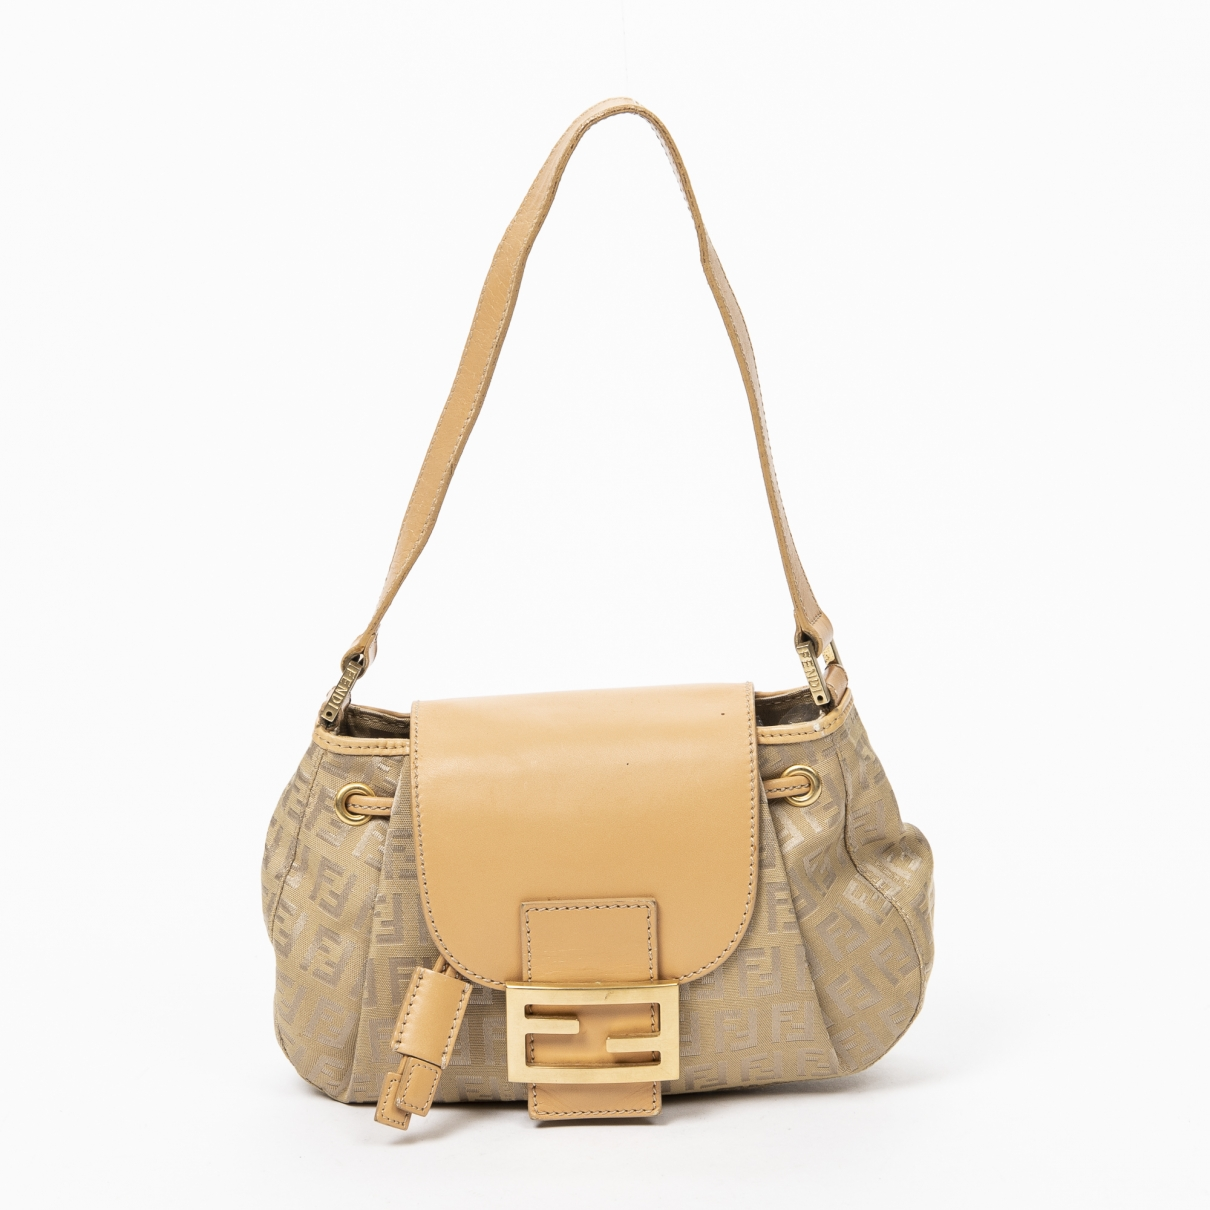 Fendi \N Handtasche in  Beige Leder